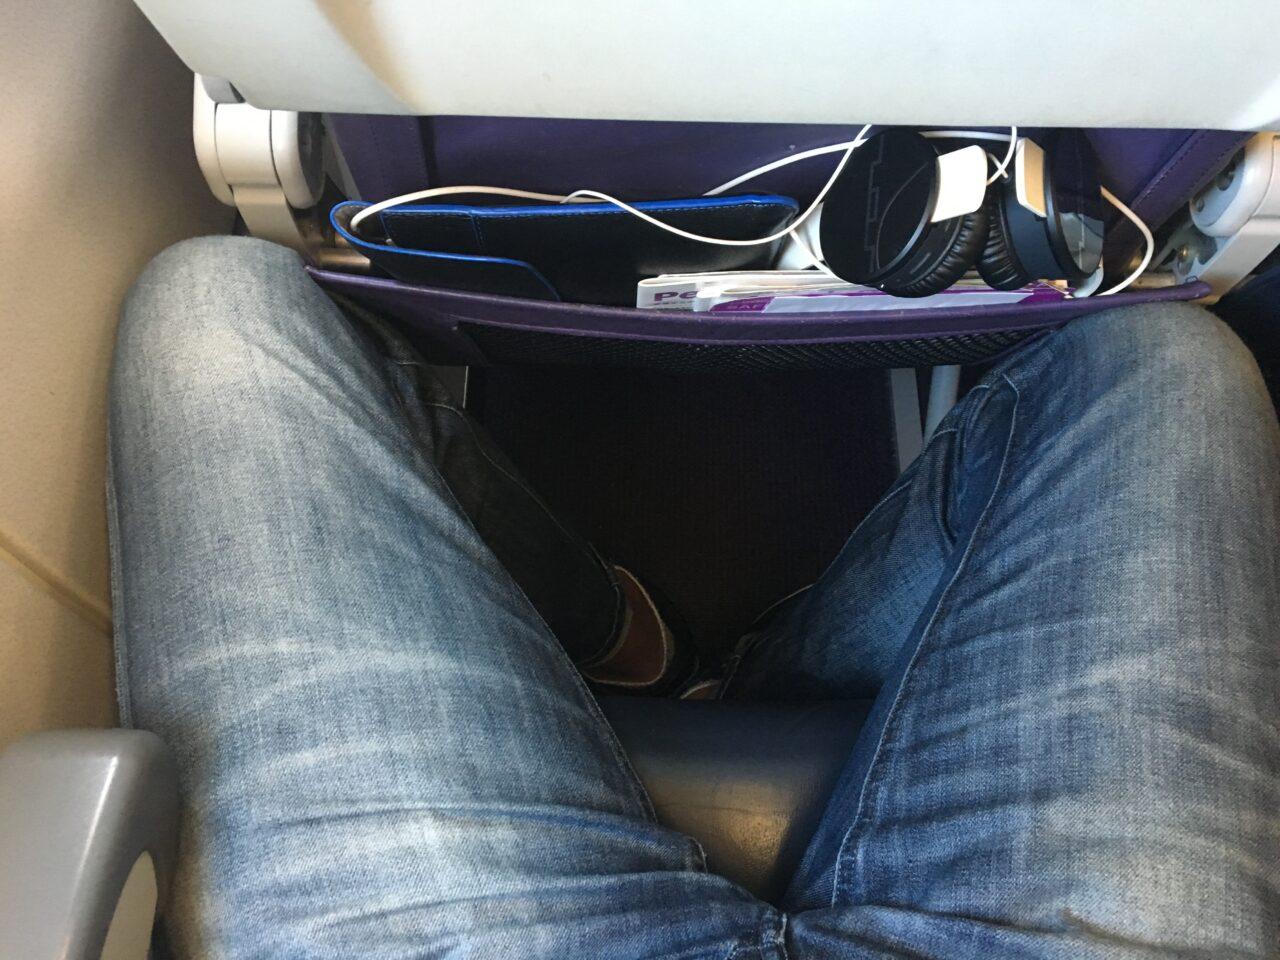 """Jetstream CHANNEL"" 2015年10月21日『.J』Episode 27: 新型「Chromecast」や「Chromecast Ayduo」のレビュー"